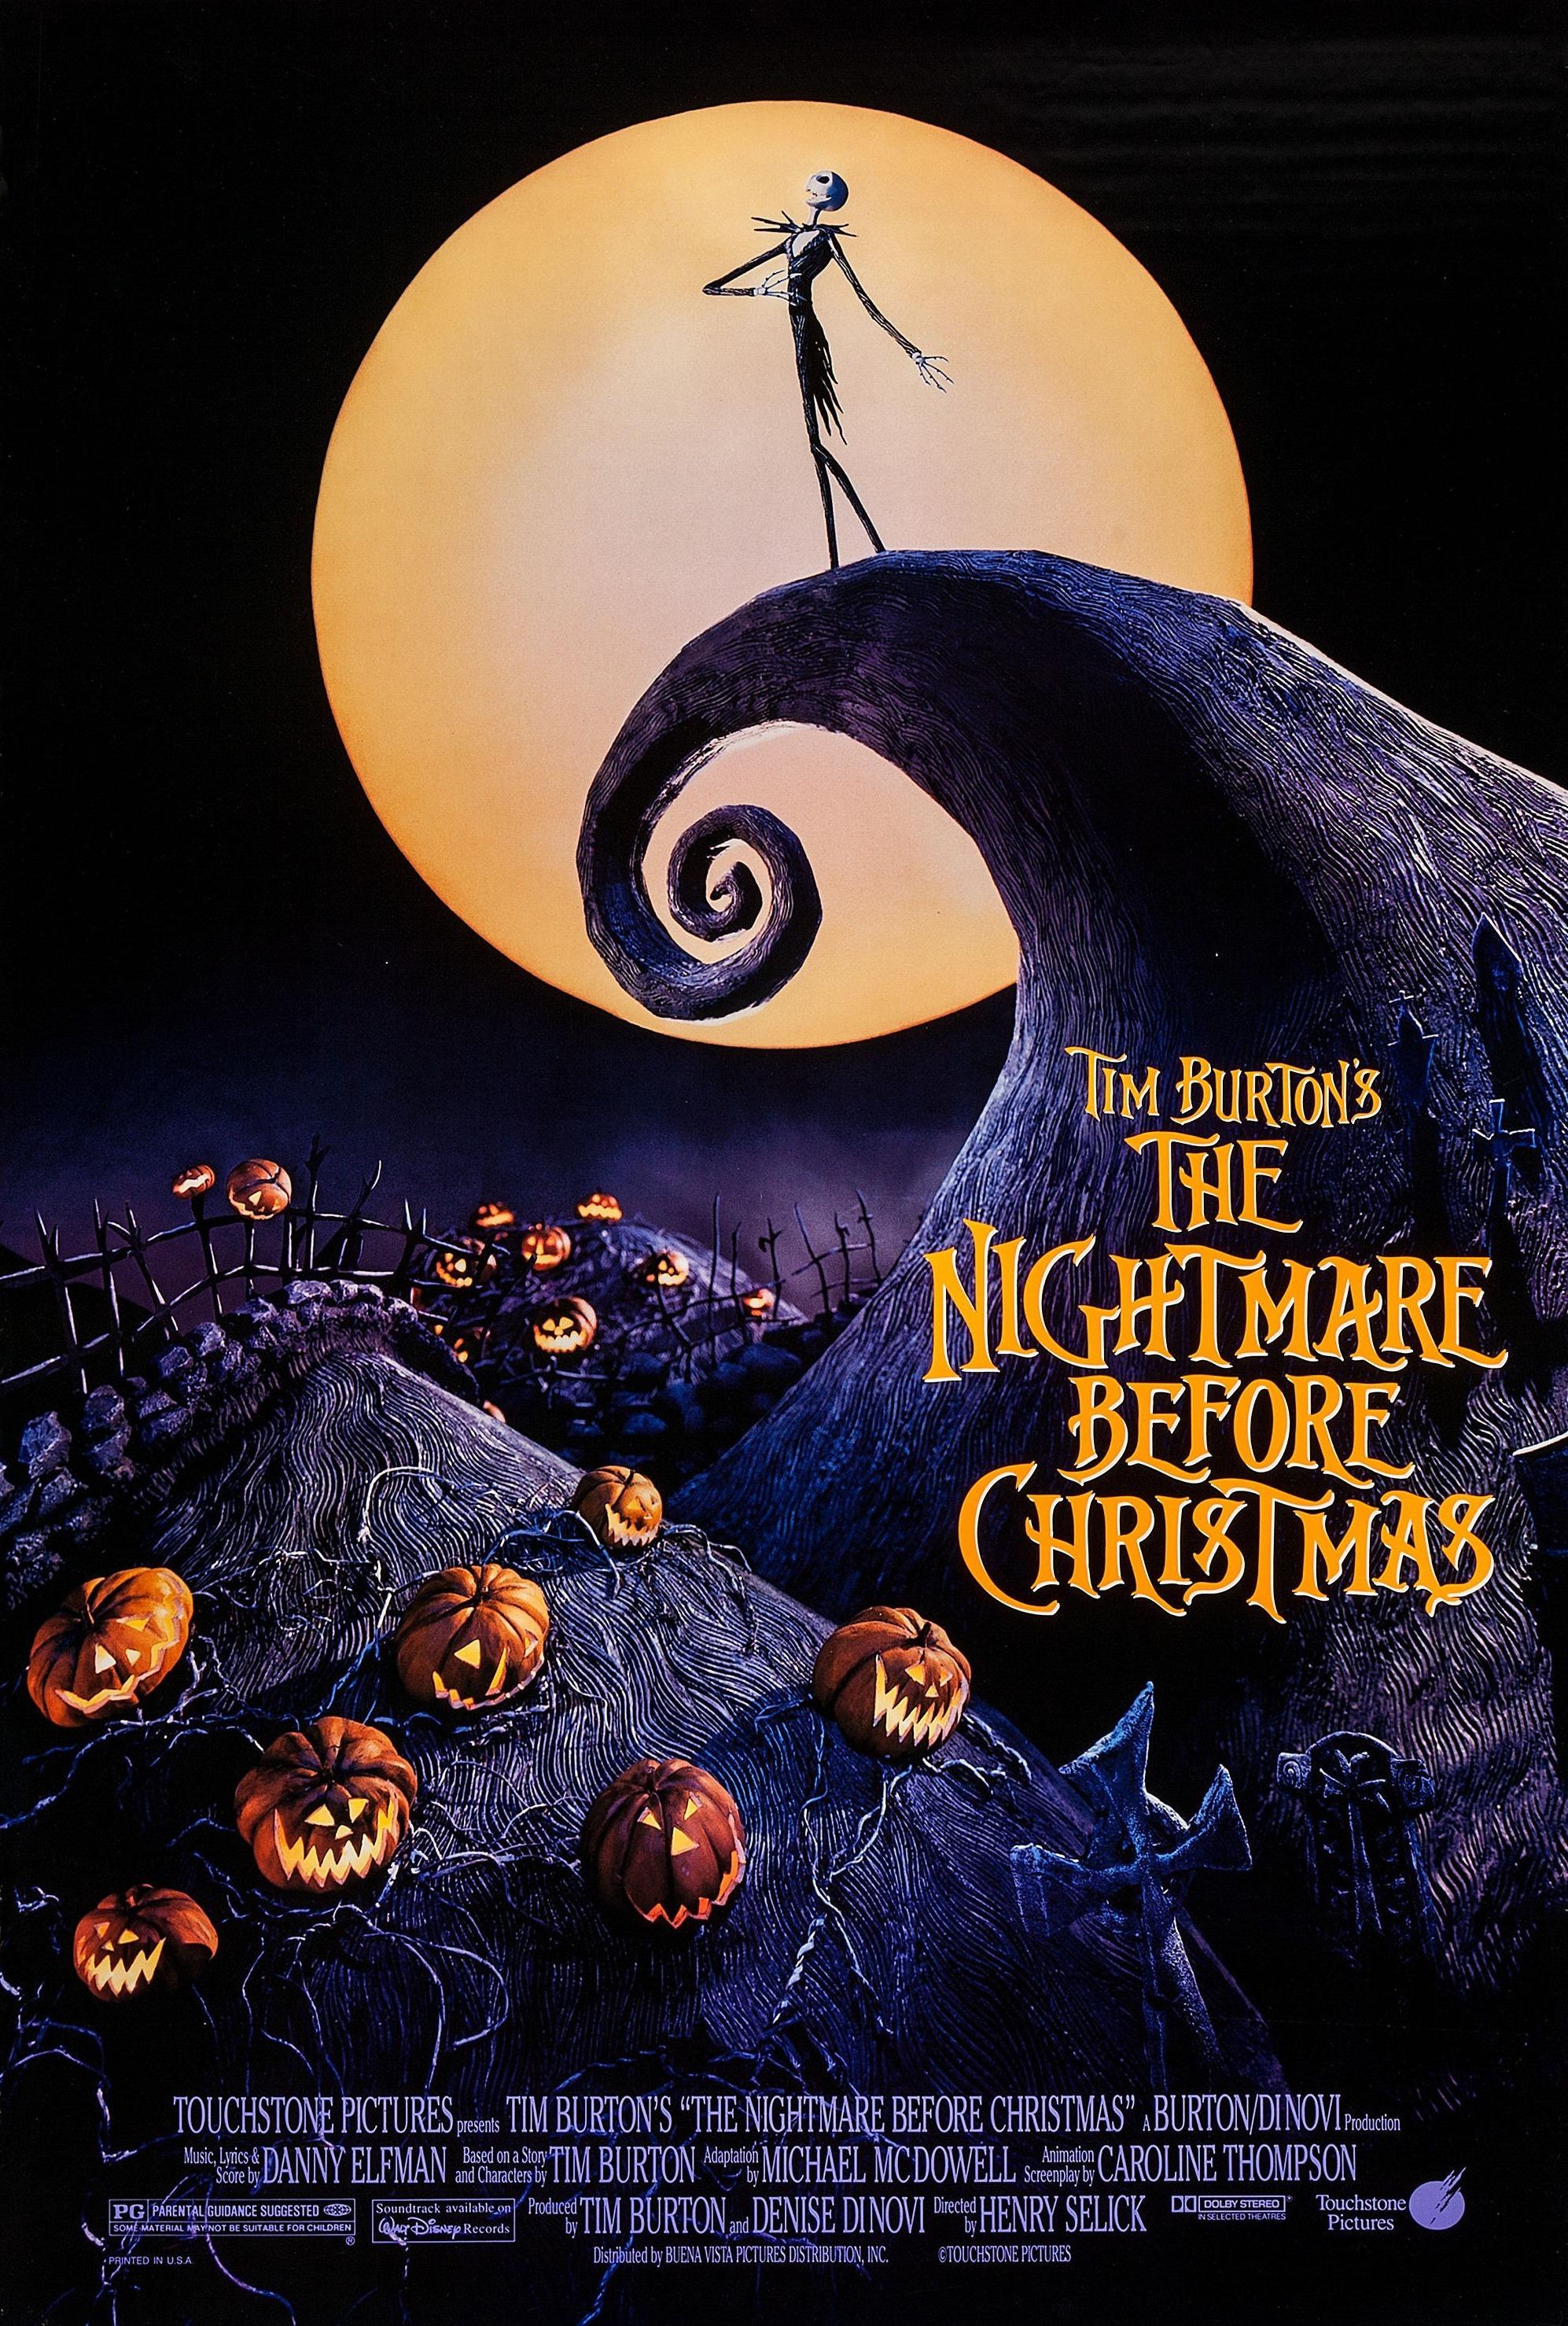 The Nightmare Before Christmas | Tim Burton Wiki | FANDOM powered by ...